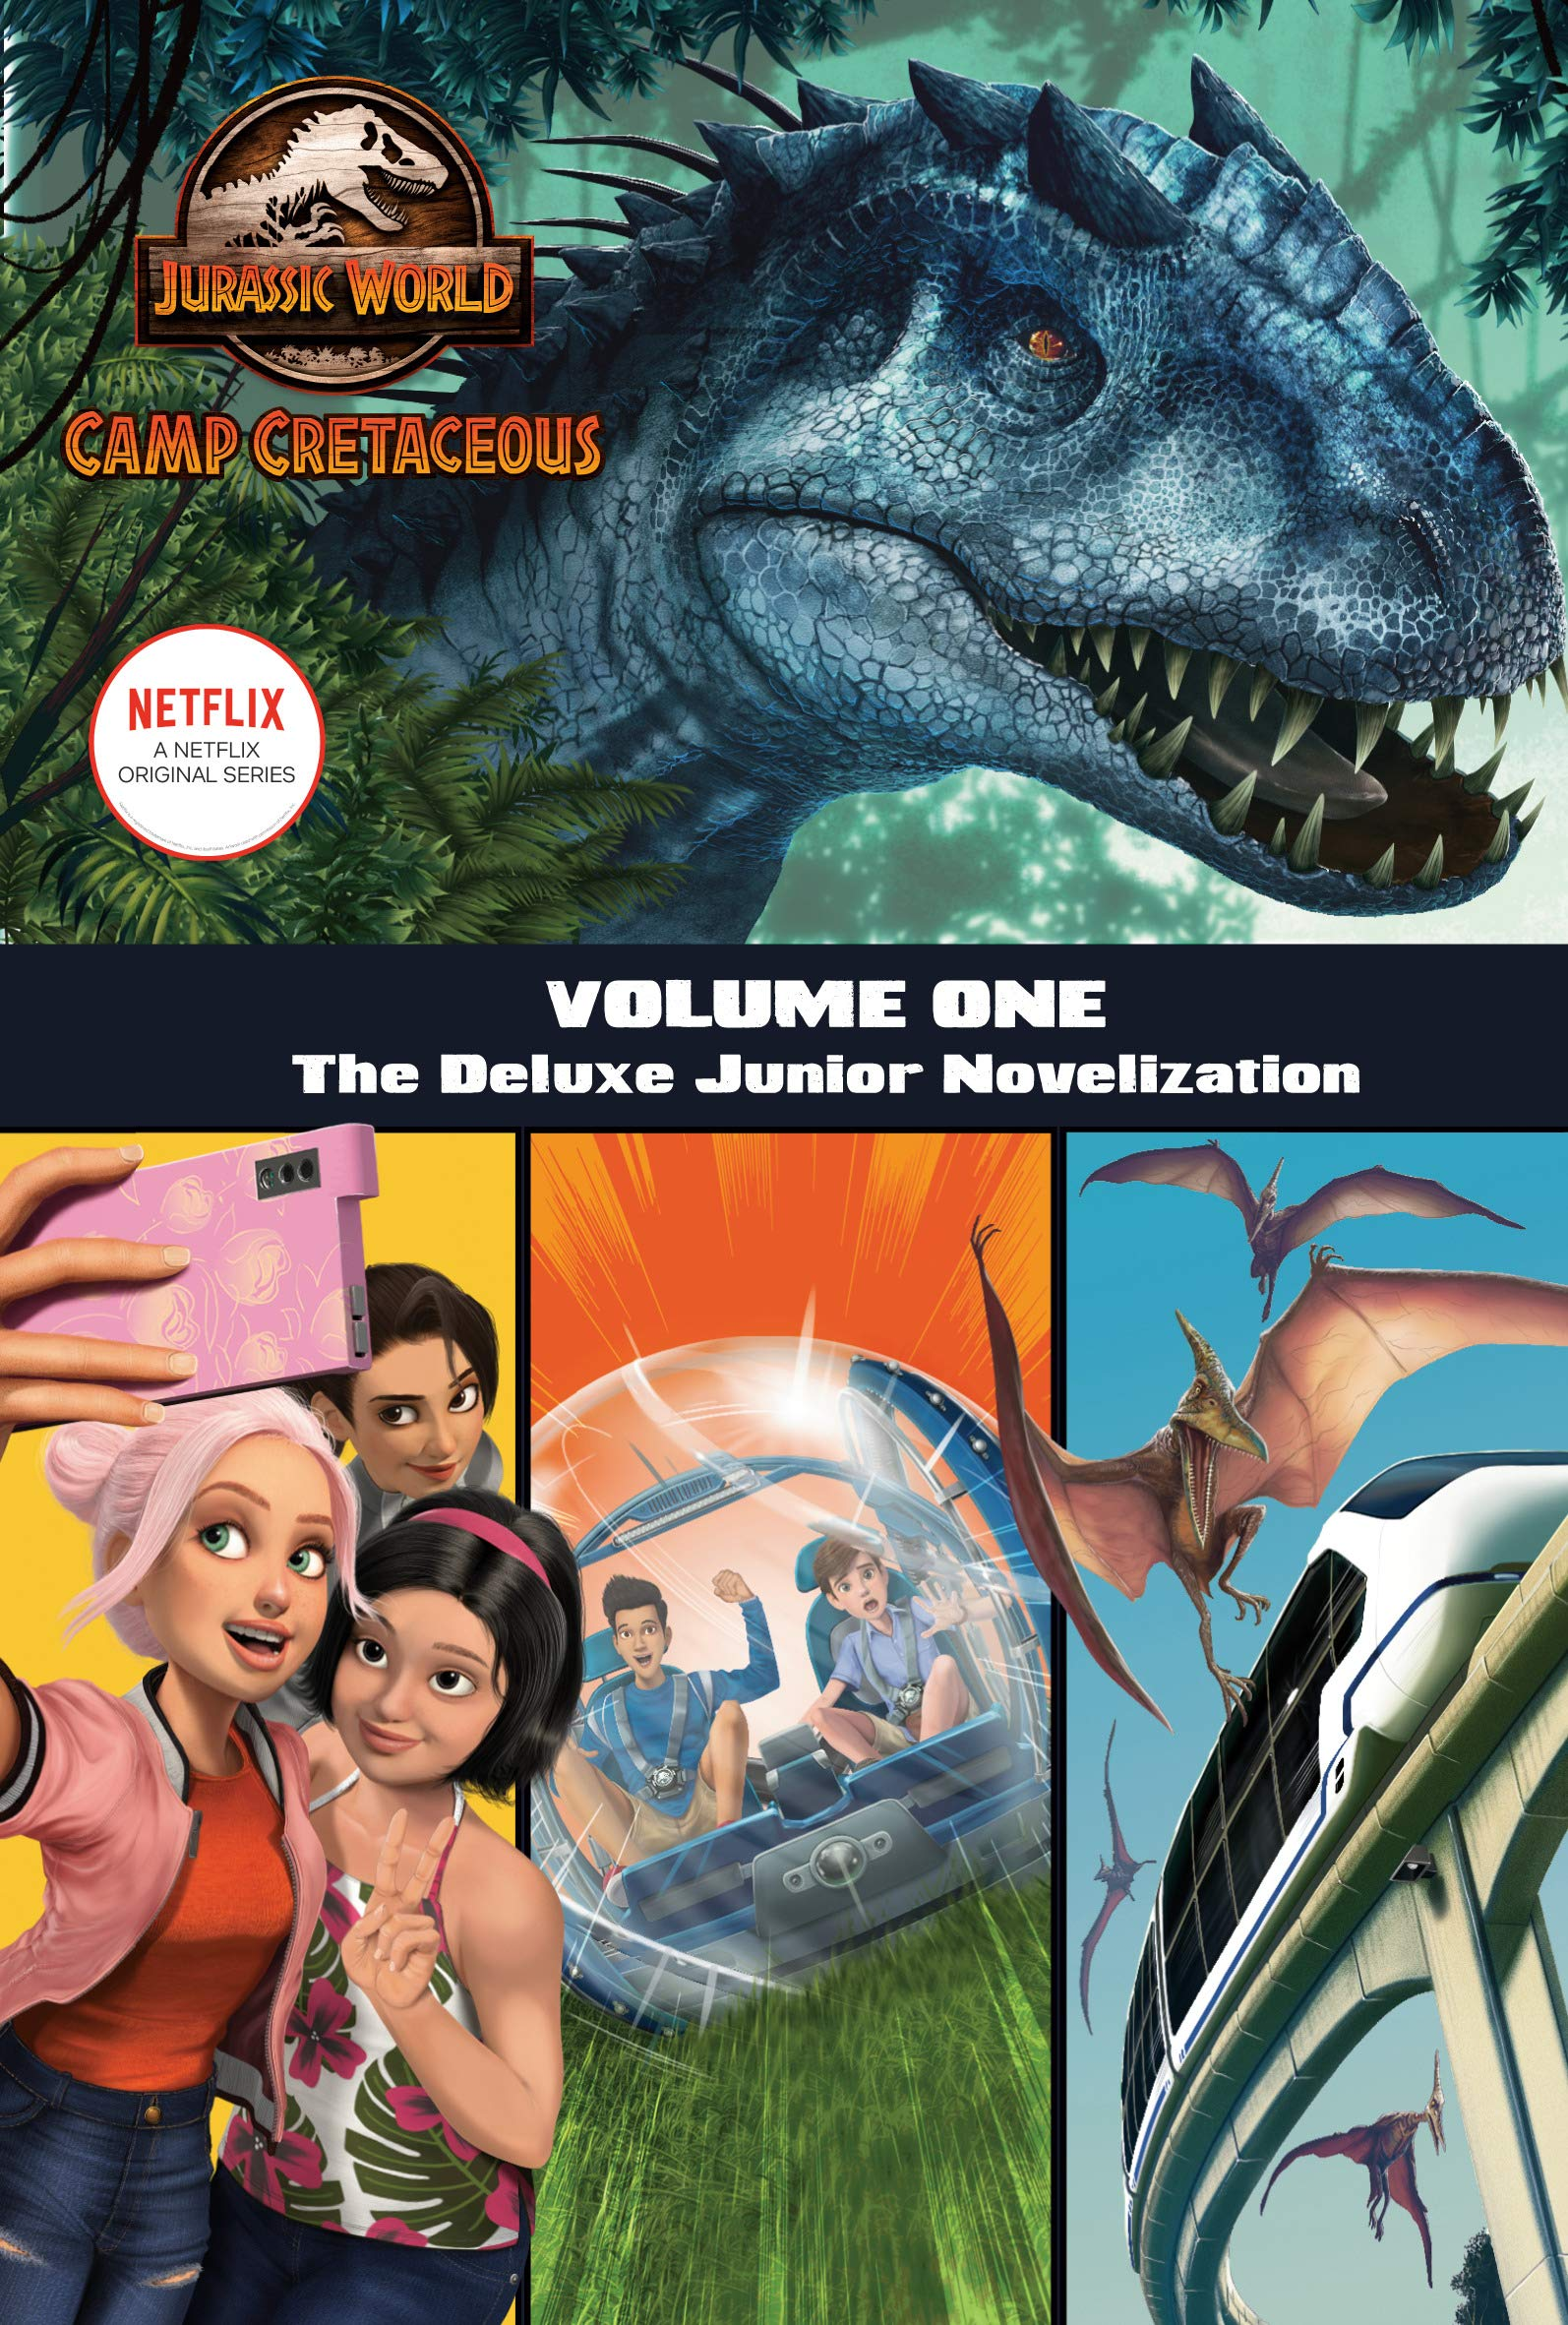 Camp Cretaceous Volume One The Deluxe Junior Novelization Jurassic World Camp Cretaceous Behling Steve 9780593303382 Amazon Com Books Jurassic world camp cretaceous 1. camp cretaceous volume one the deluxe